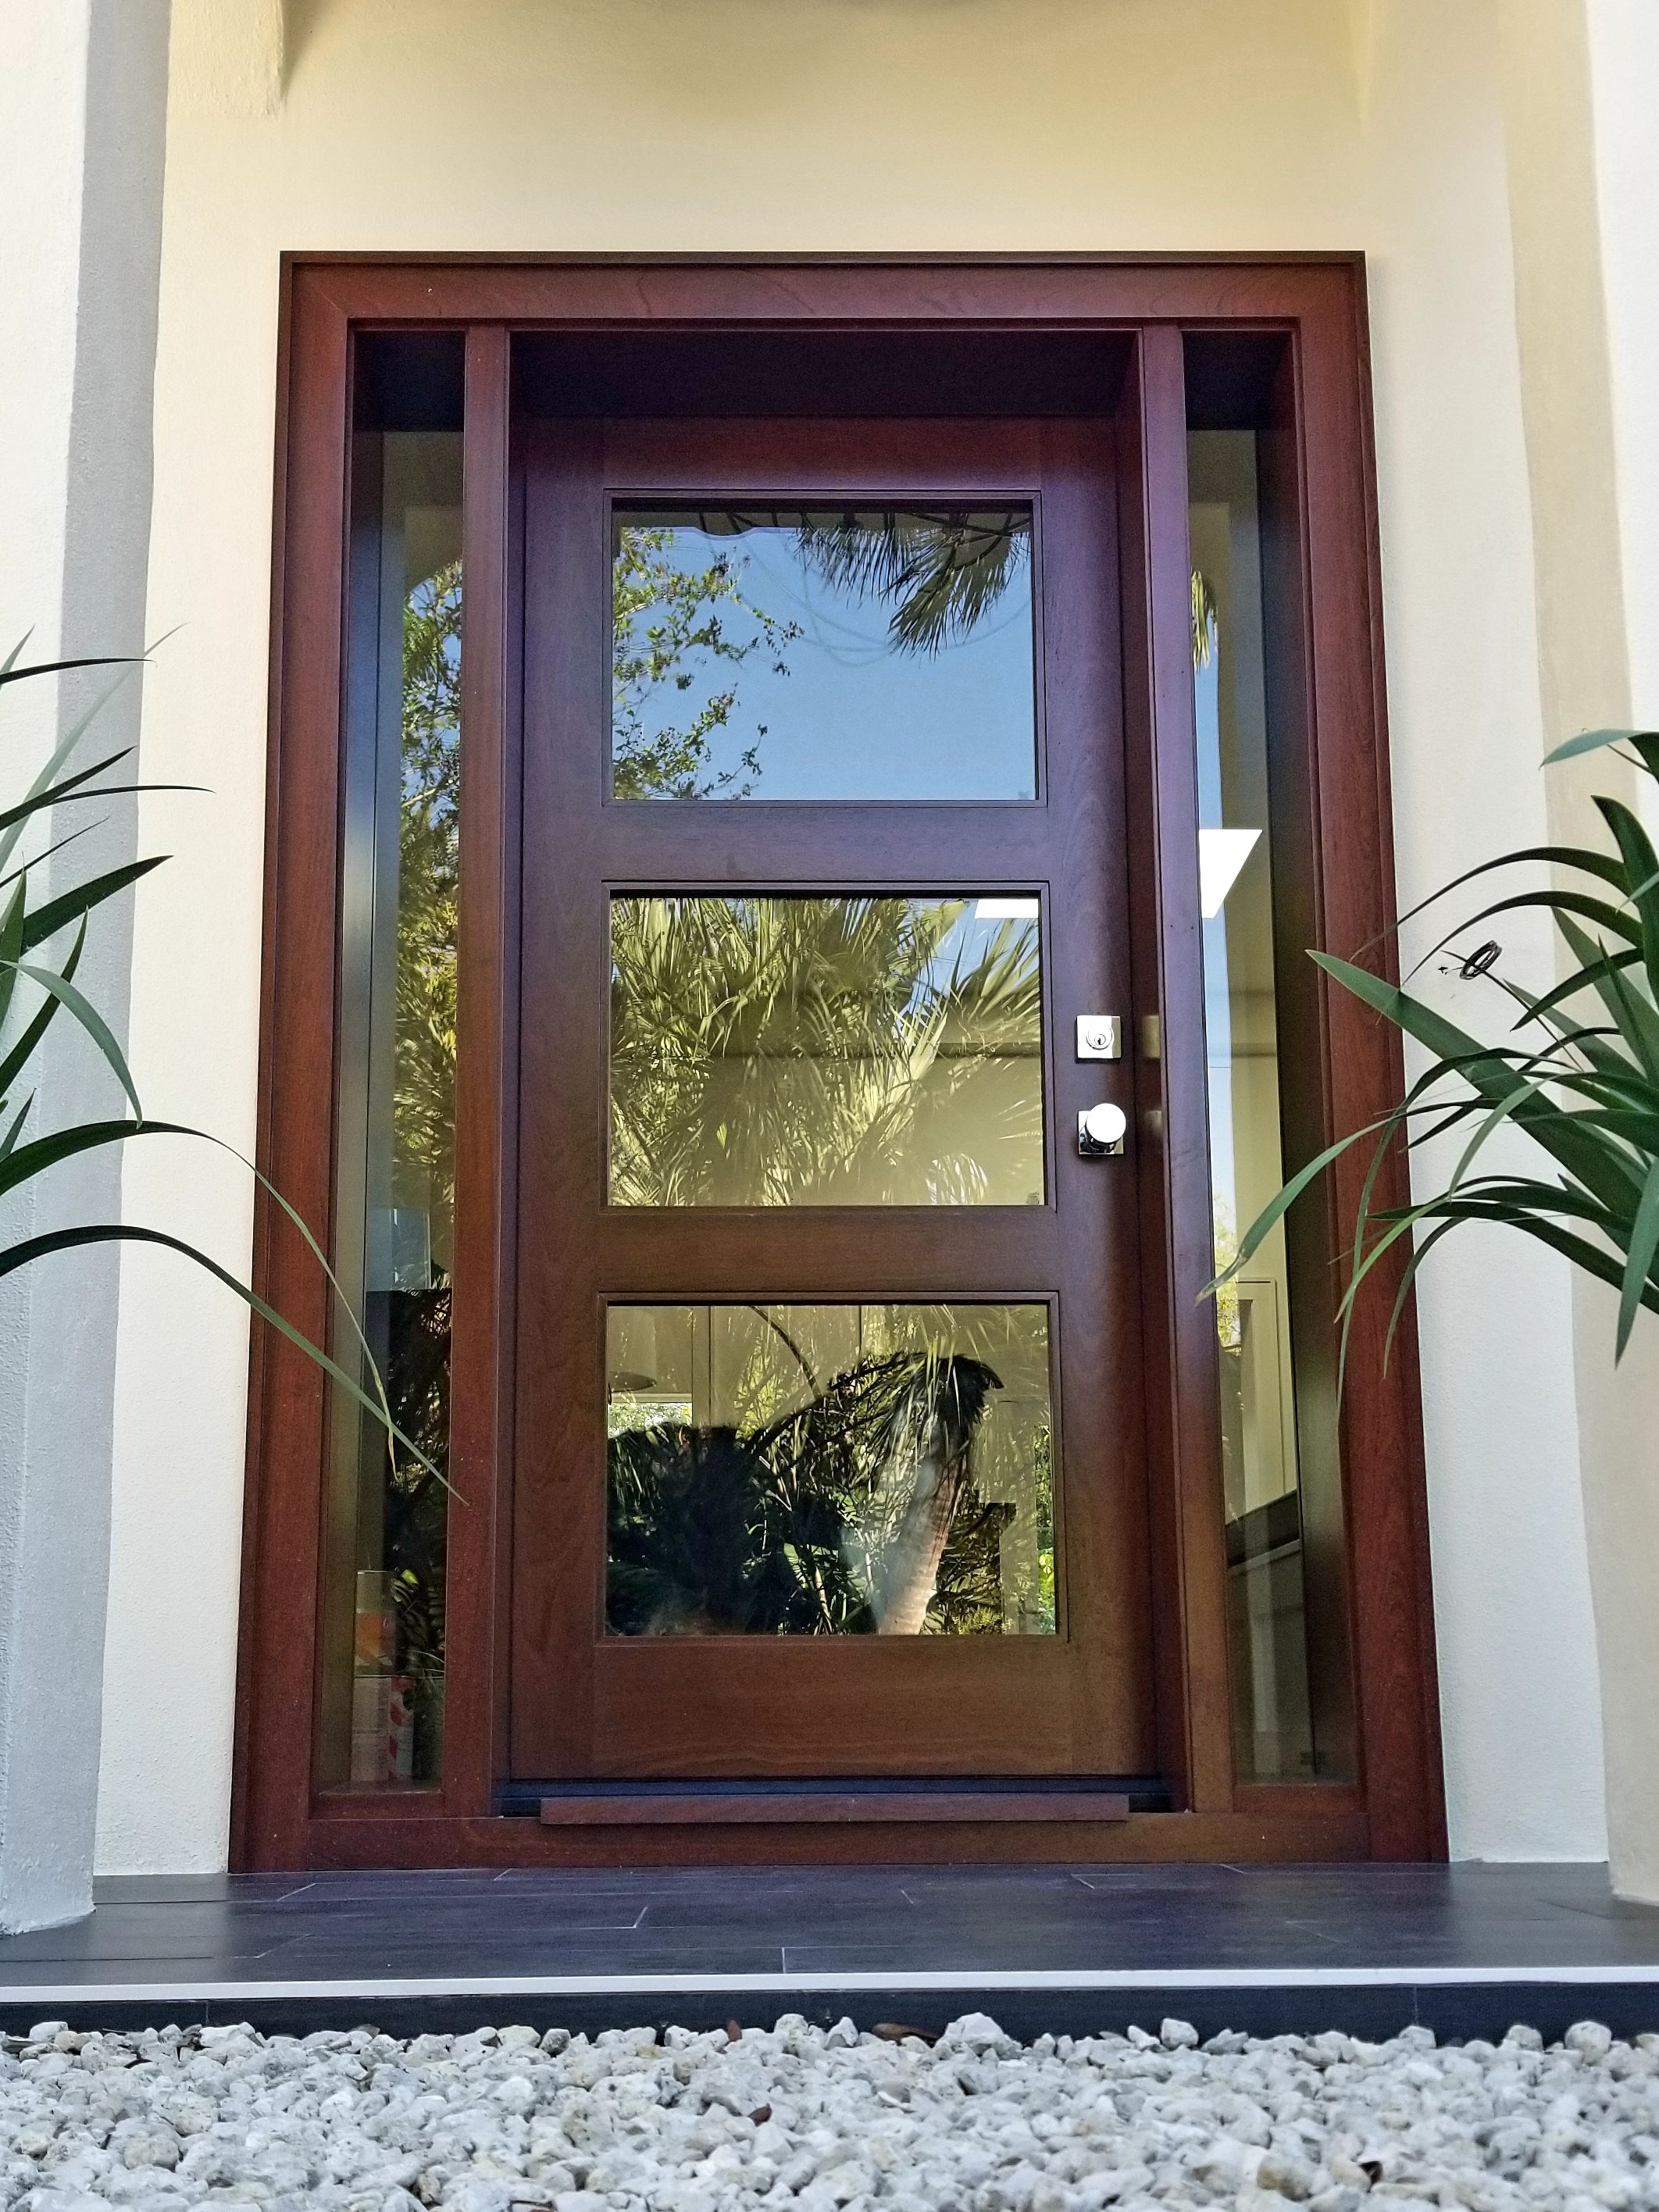 Hurricane Impact Rated Modern Sapele Home Entry Door In Sarasota Fl Fhwoodworking Com Exterior Doors With Glass Modern Window Design Exterior Doors